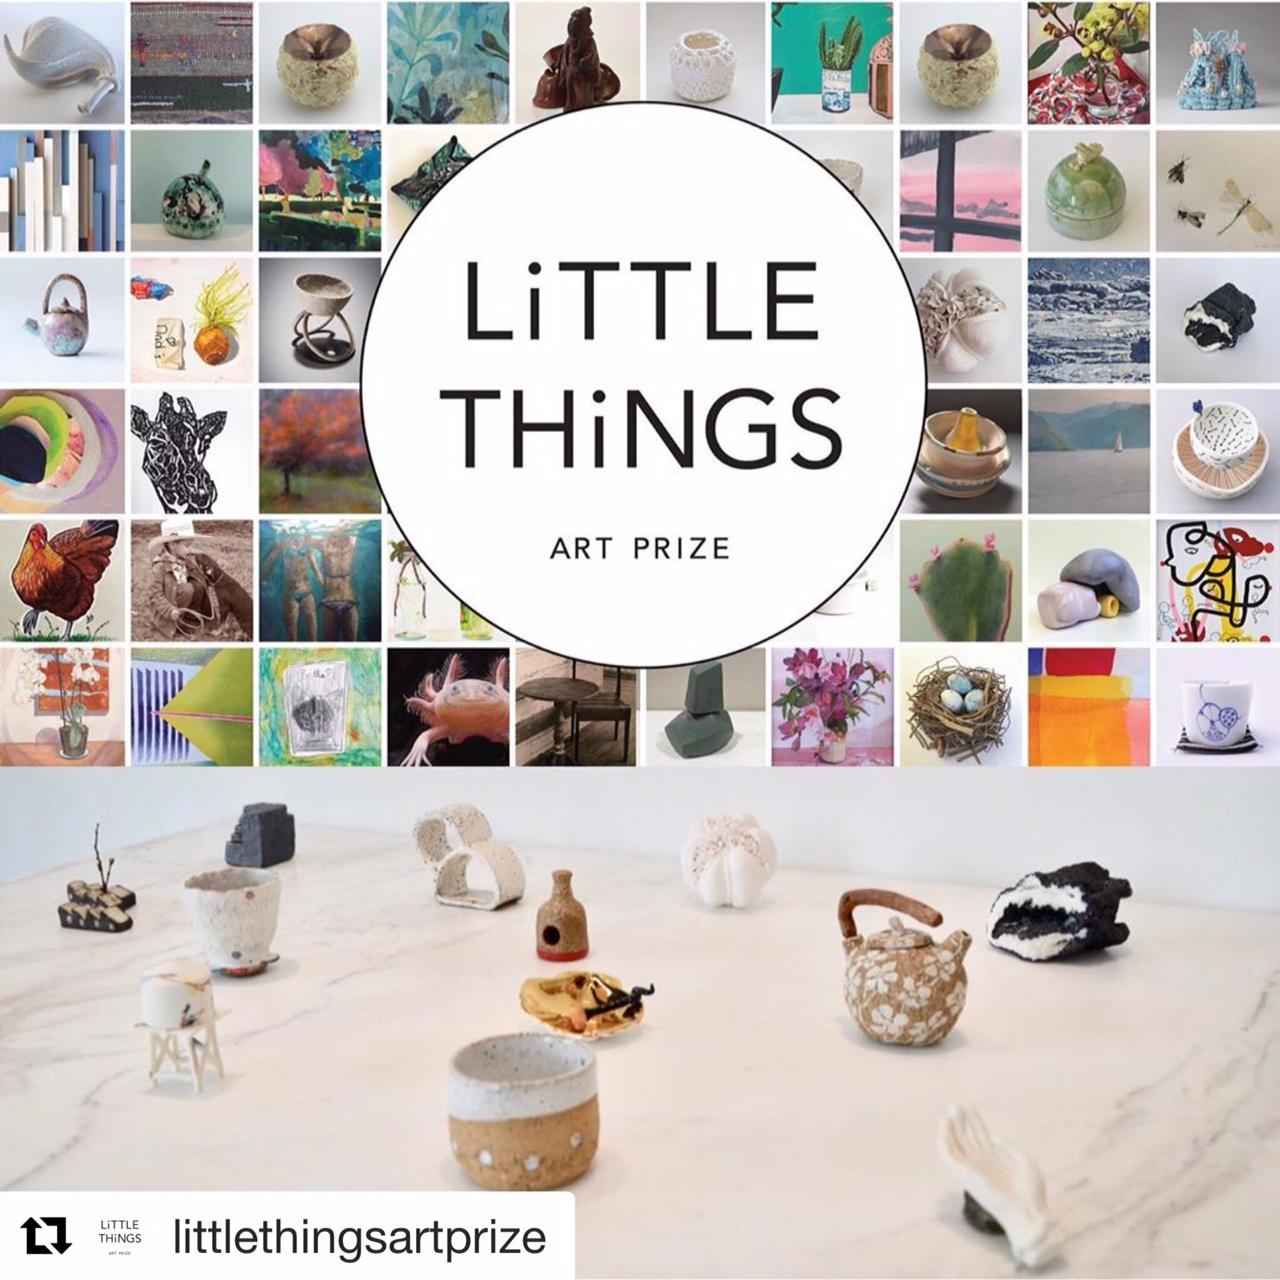 GOST_Little Things Art Prize_grid.jpg